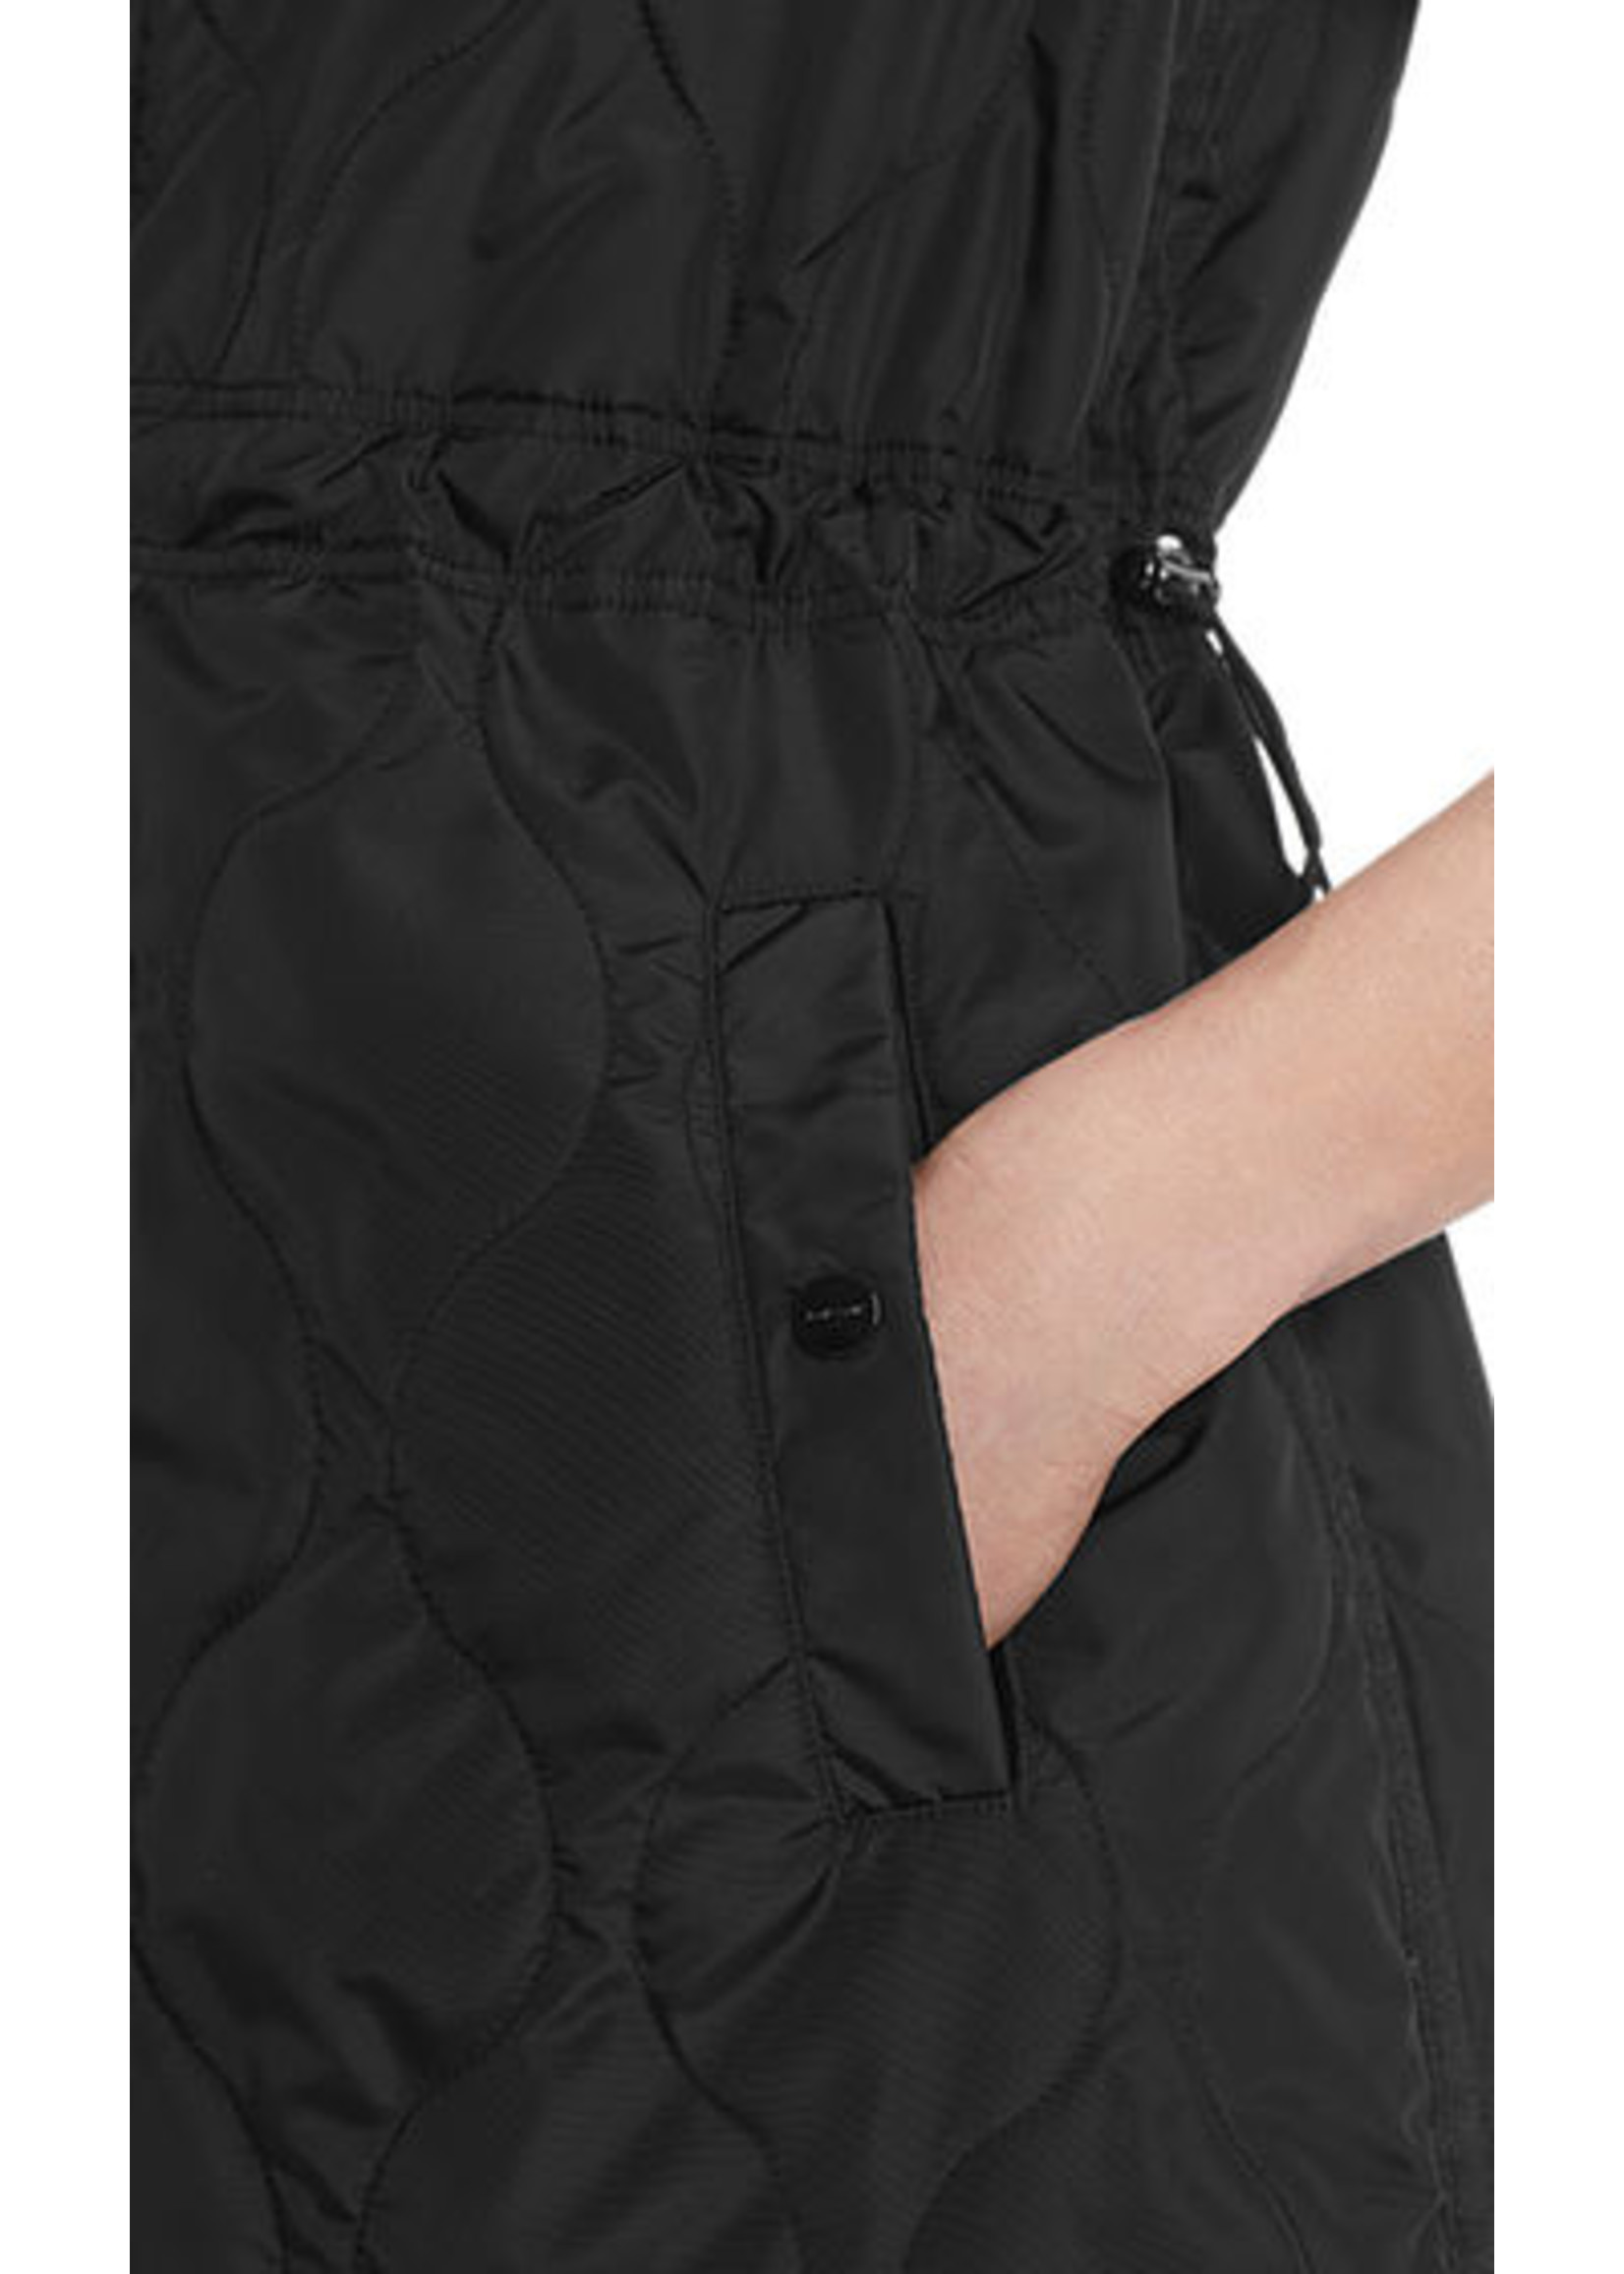 Marccain Sports Bodywarmer RS 37.01 W74 black